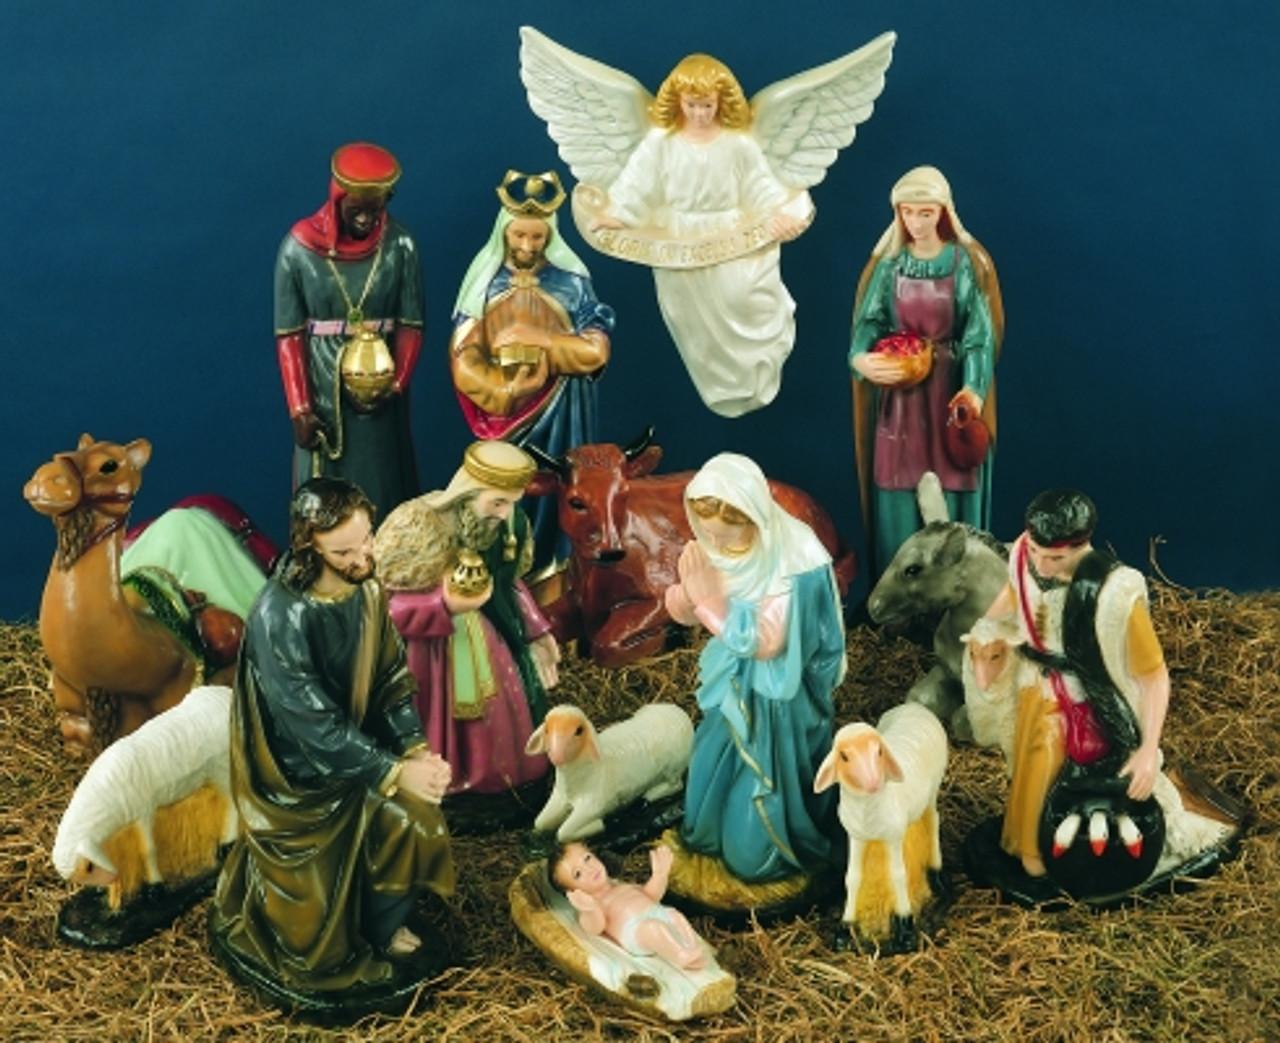 36 full color outdoor nativity scene 15 pieces